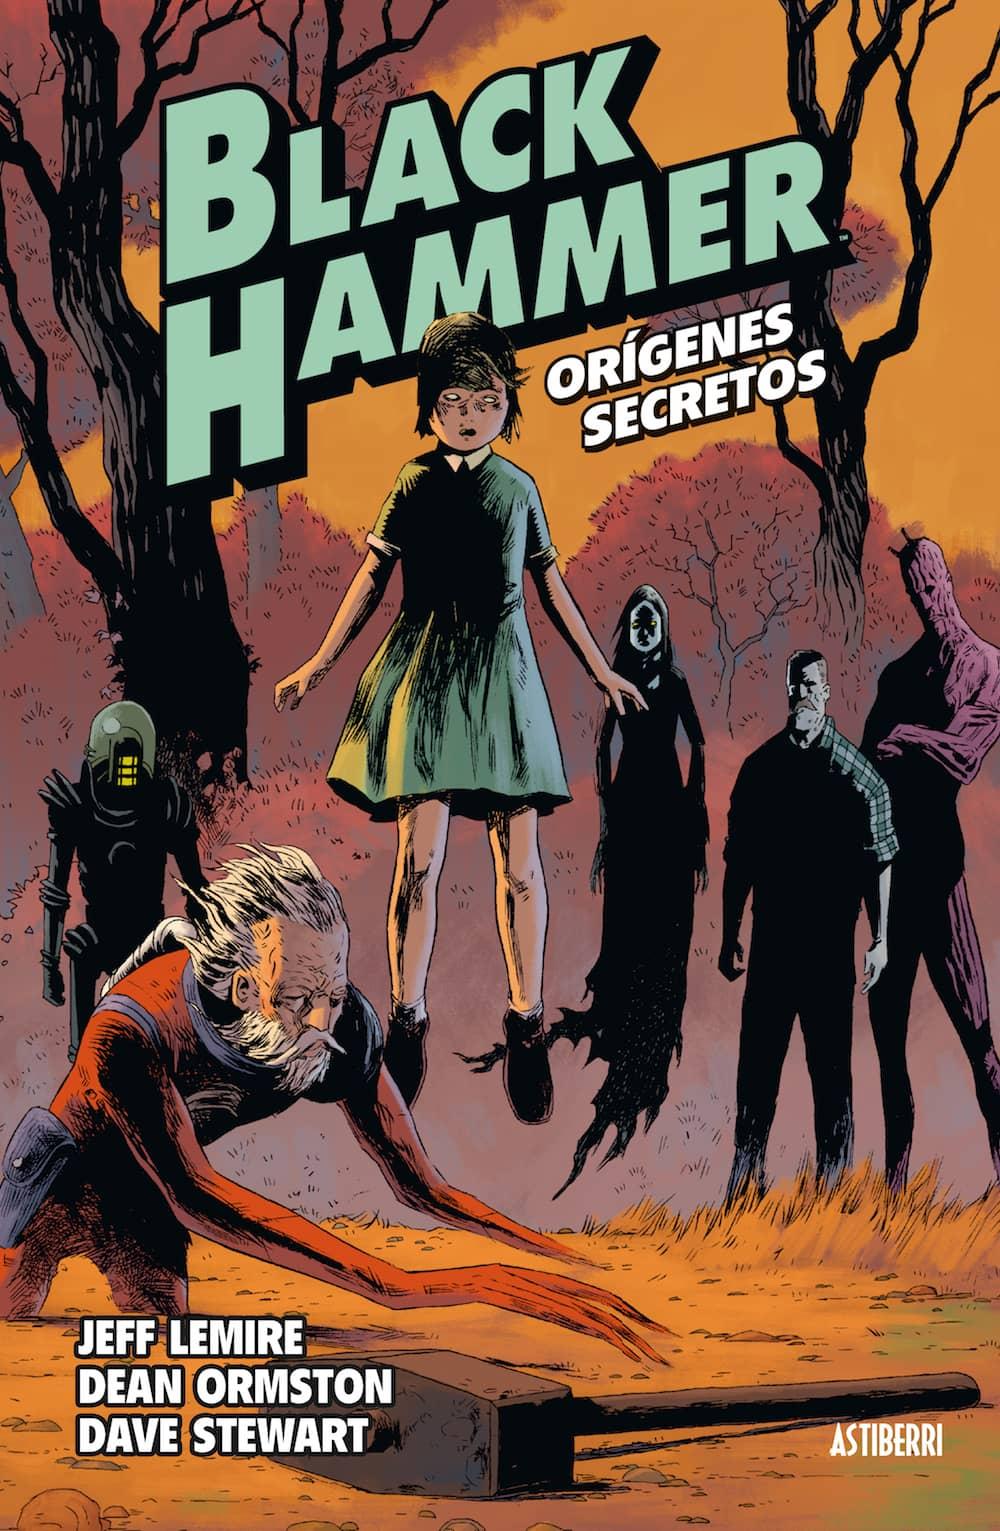 BLACK HAMMER 01. ORIGENES SECRETOS